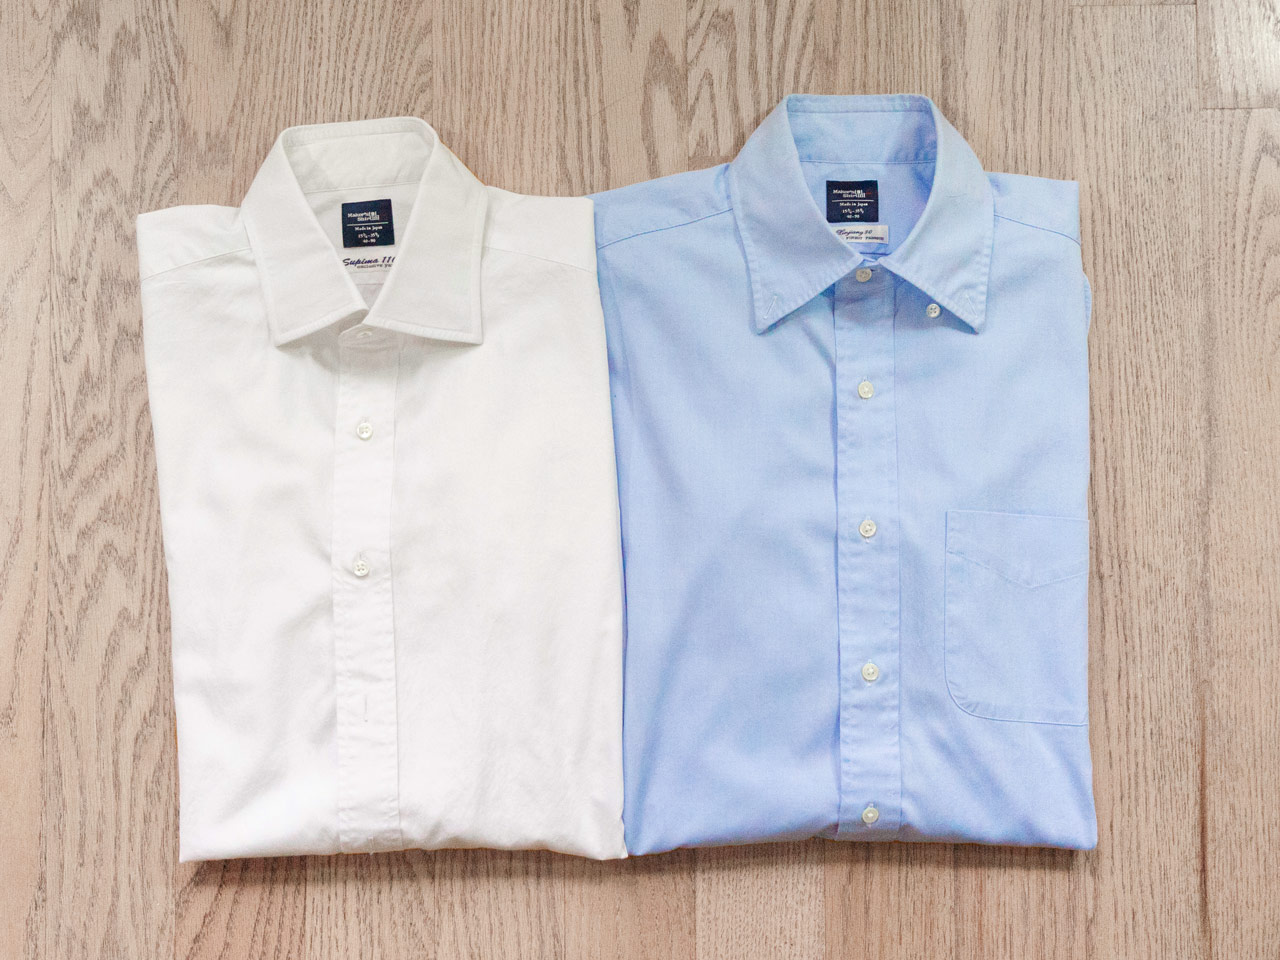 effortless essentials minimalist wardrobe - dress shirts